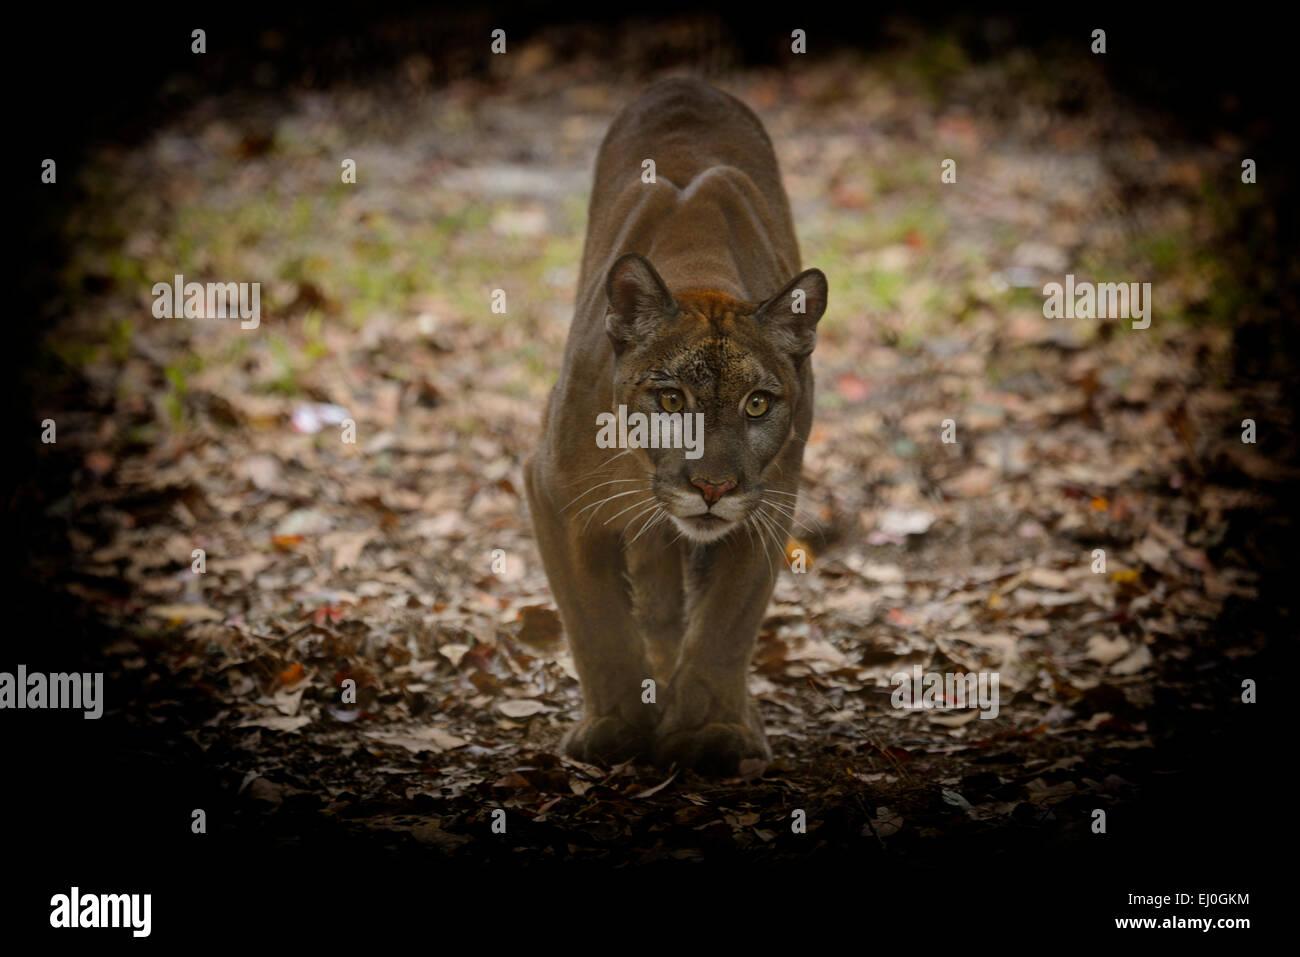 USA, Florida, Tallahassee, Panhandle, Puma concolor coryi, Florida panther in Tallahassee museum, captive Puma - Stock Image